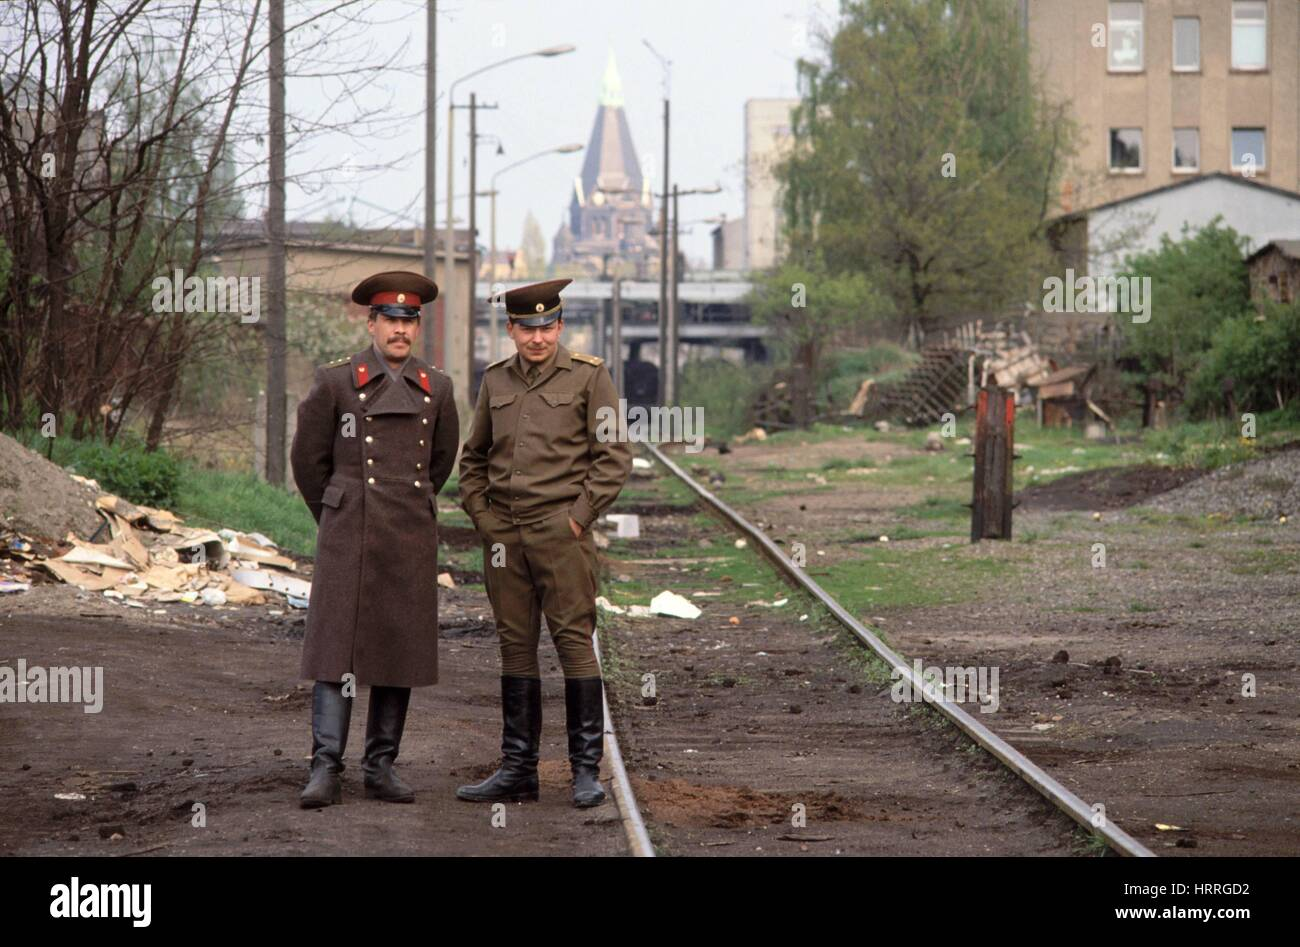 Sowjetarmee In Der Ddr